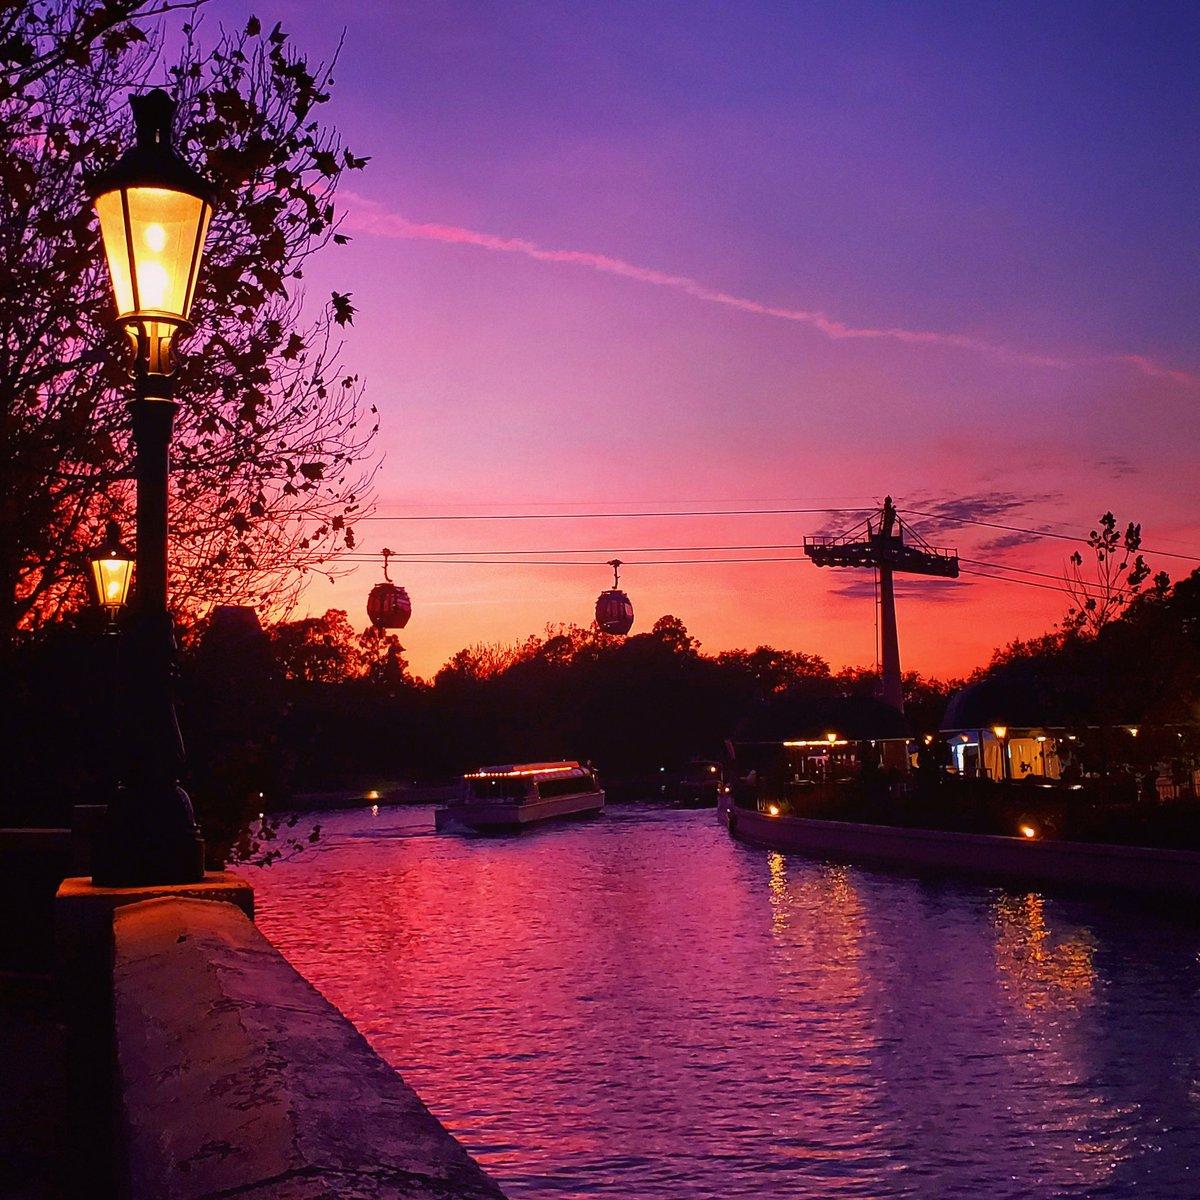 EPCOT sunset tonight over International Gateway! 💜❤🧡💛 #epcot #sunsets #disney #disneyworld #orlando